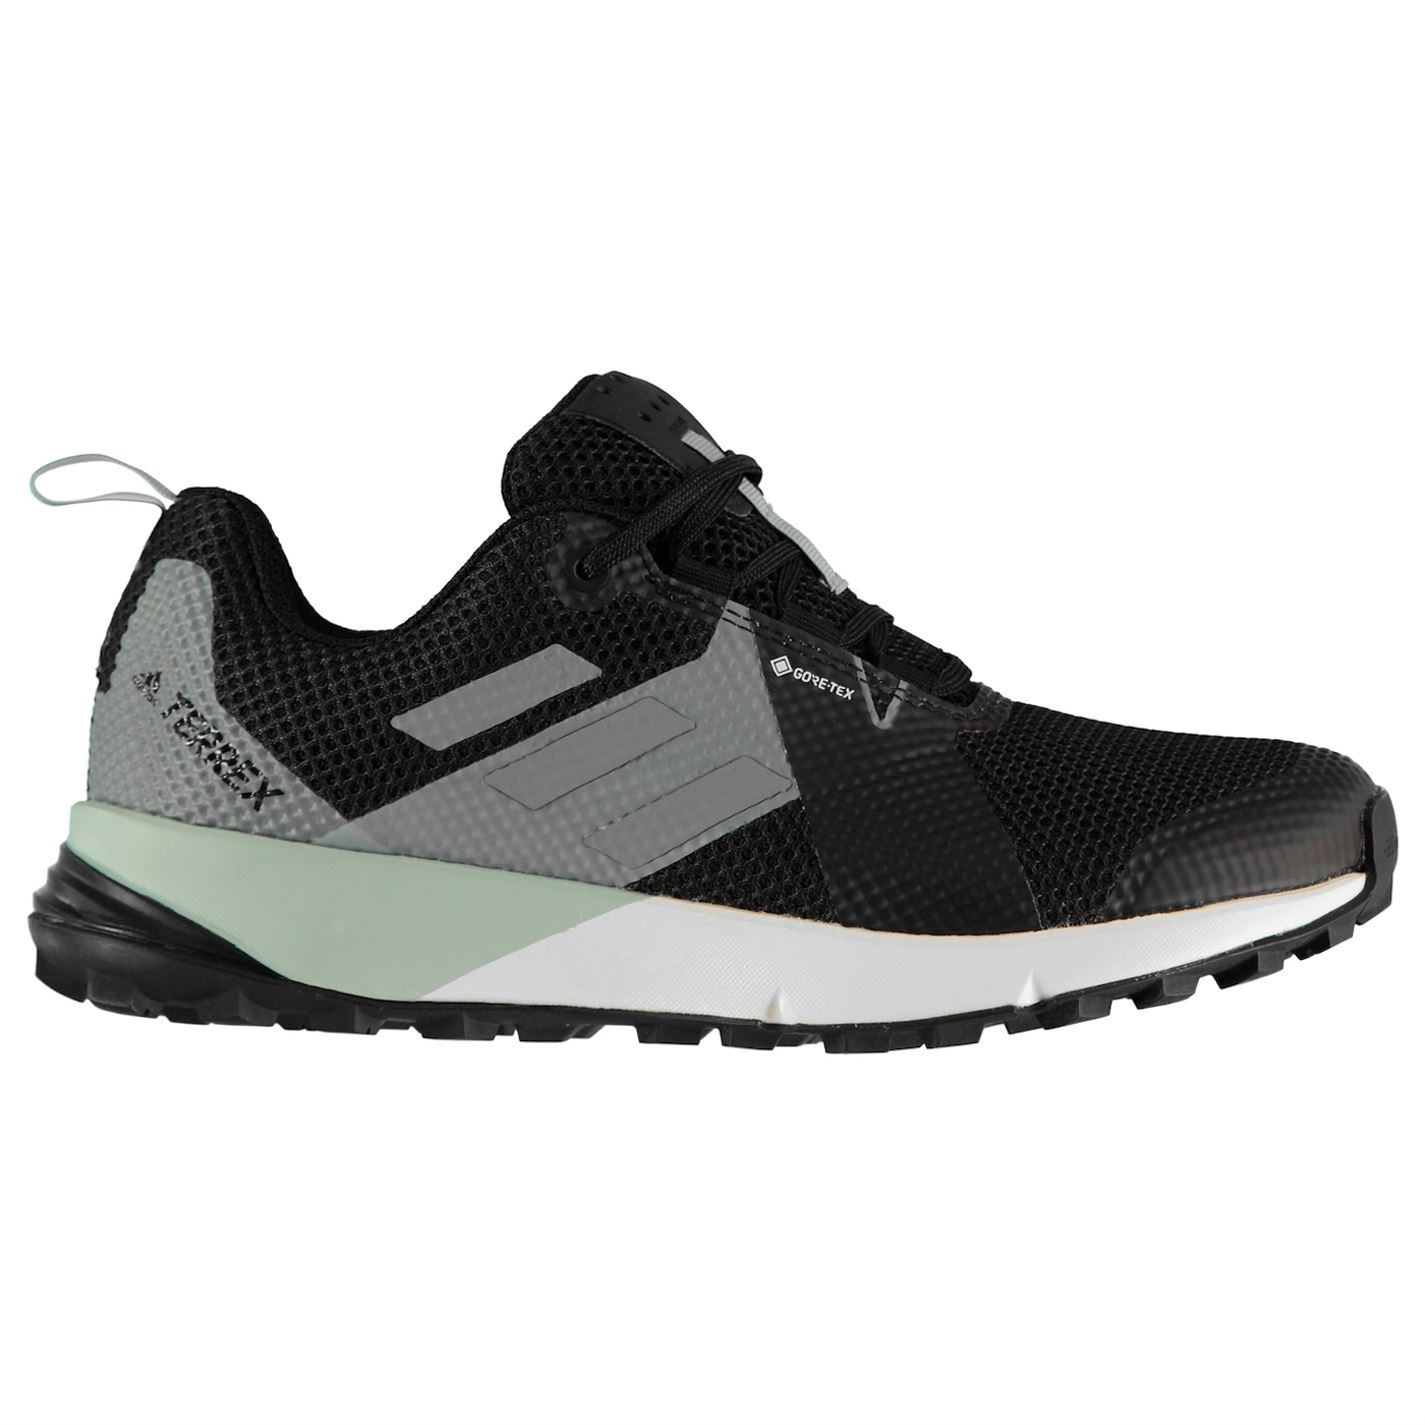 Adidas Terrex 2 Ld02